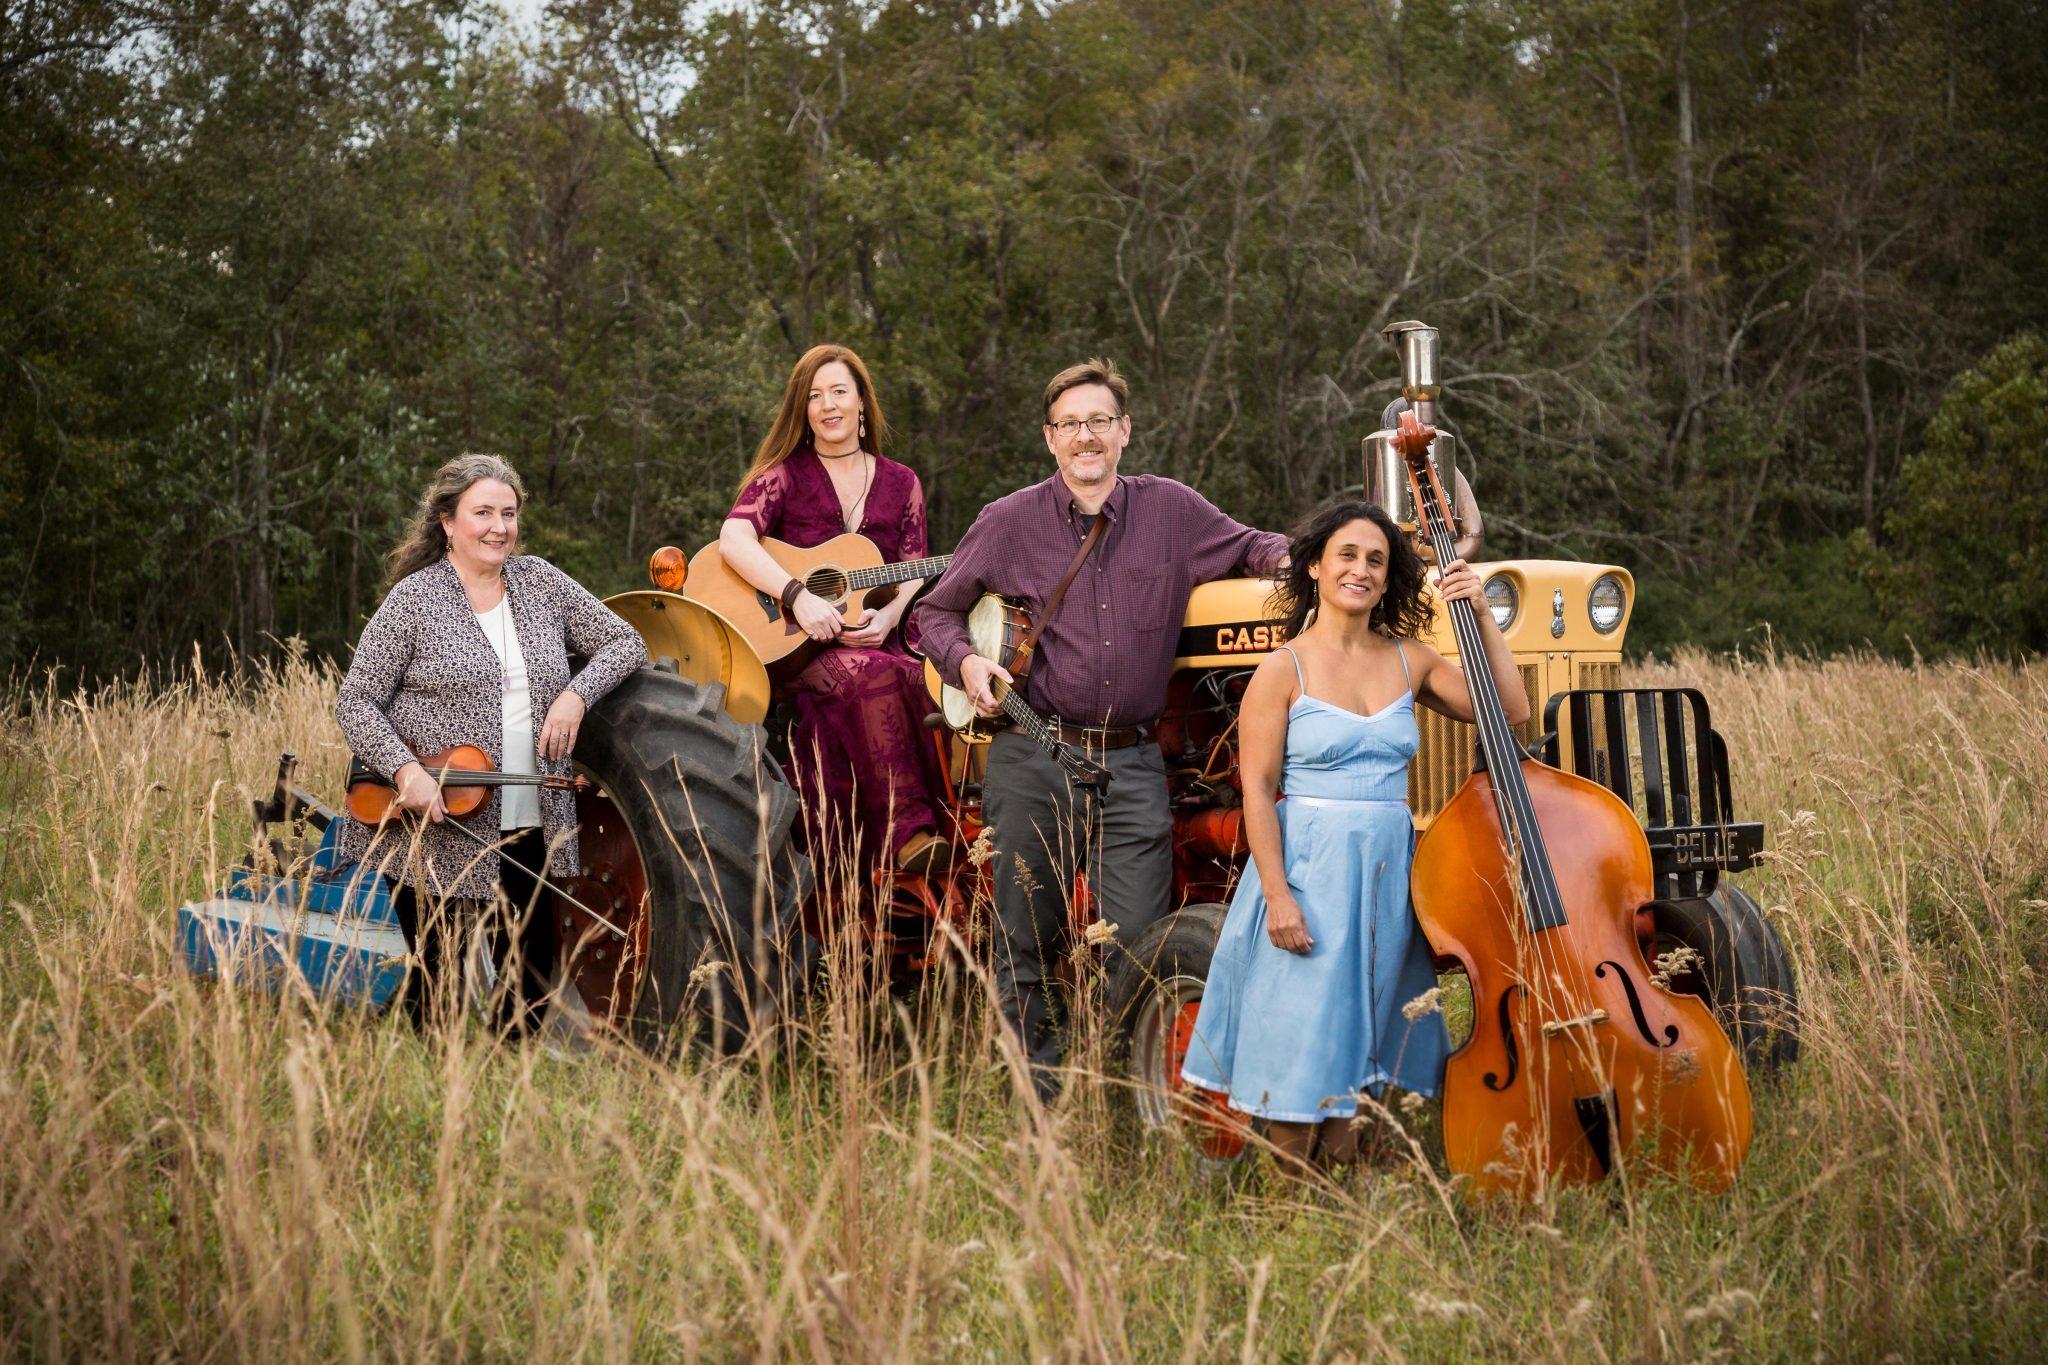 Cane Creek String Band